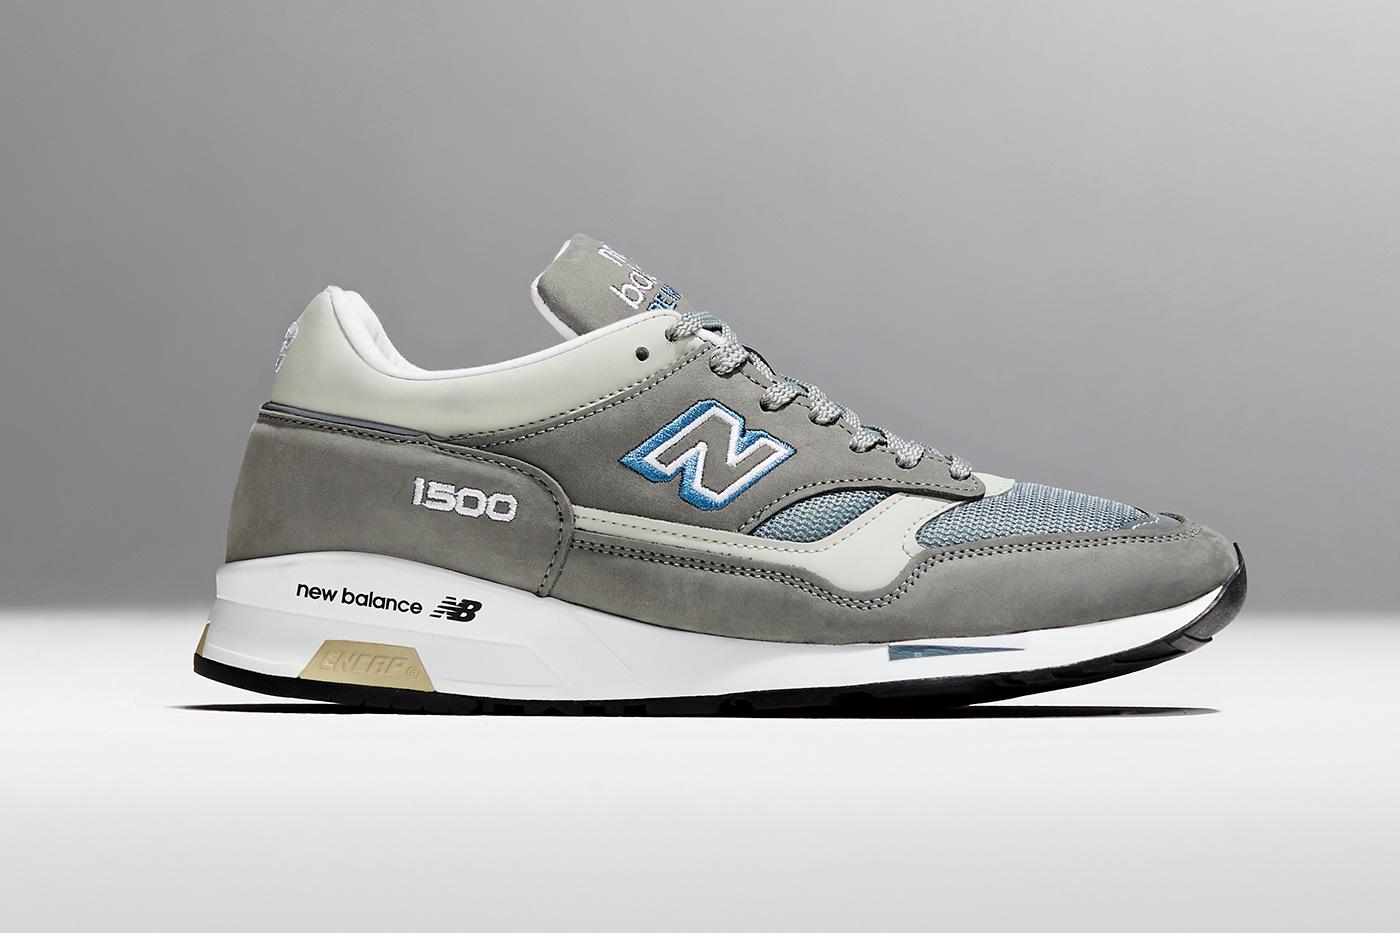 new balance(ニューバランス) 革靴とローテーションで履いても活用しやすい「1500」